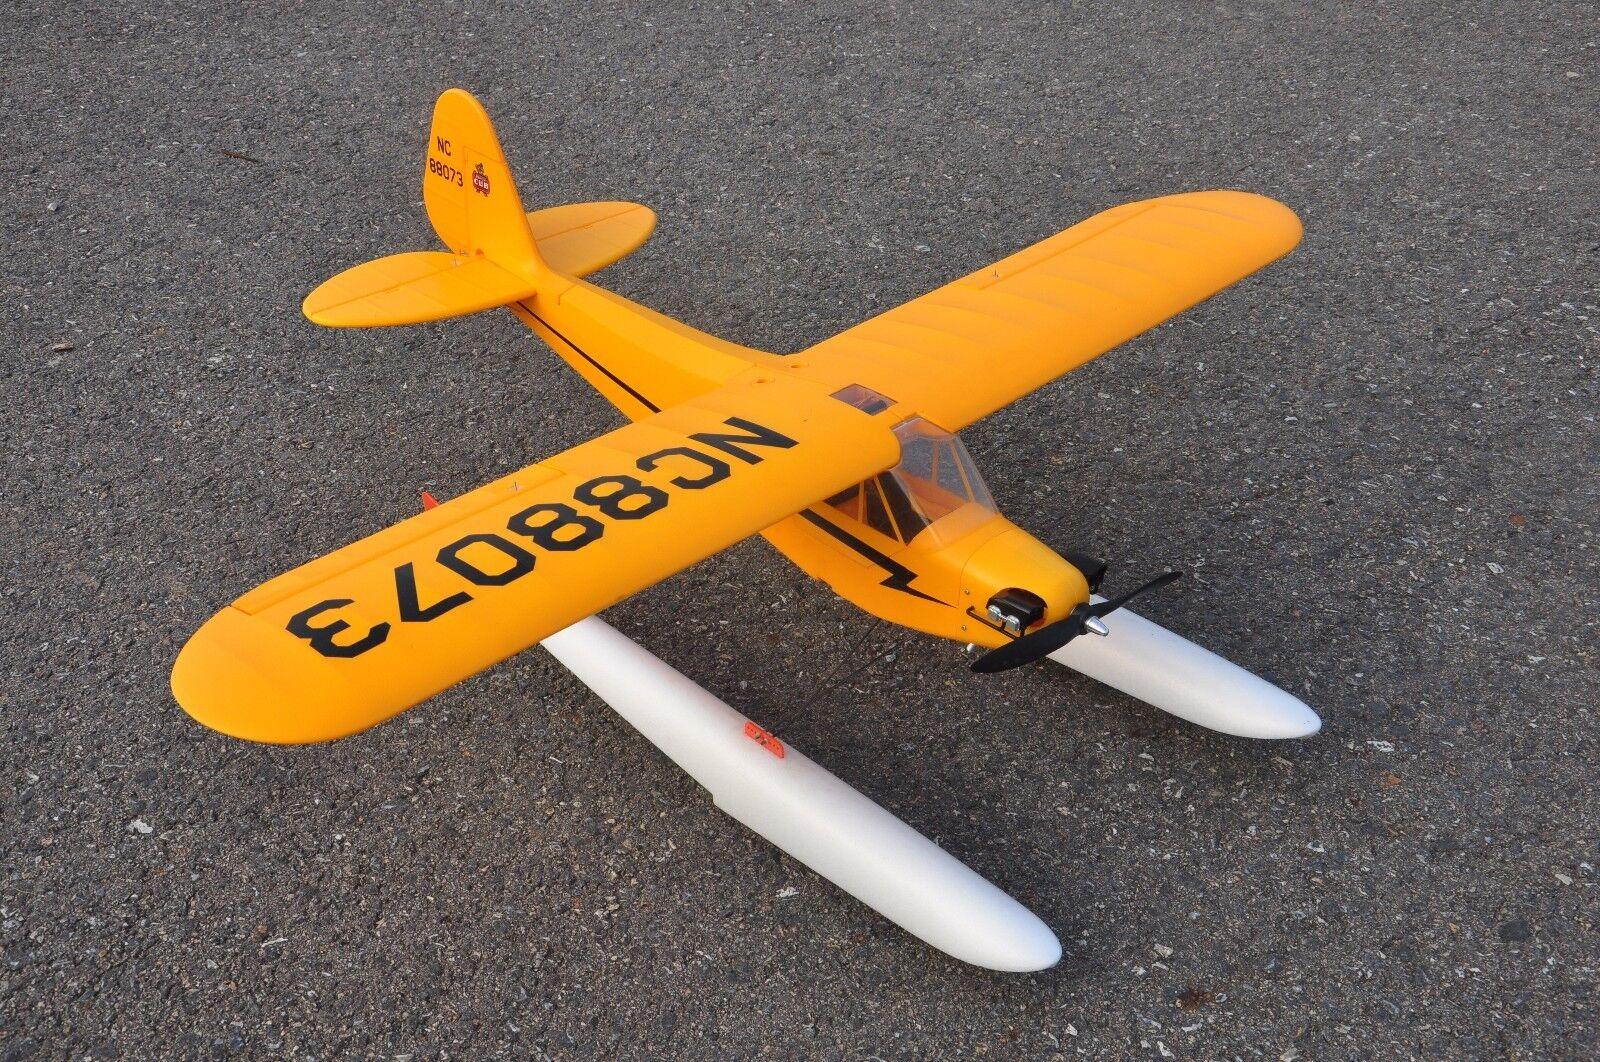 Dragon 4S 1400MM J3 Cub Piper Cub PNP w/landing gear & floats